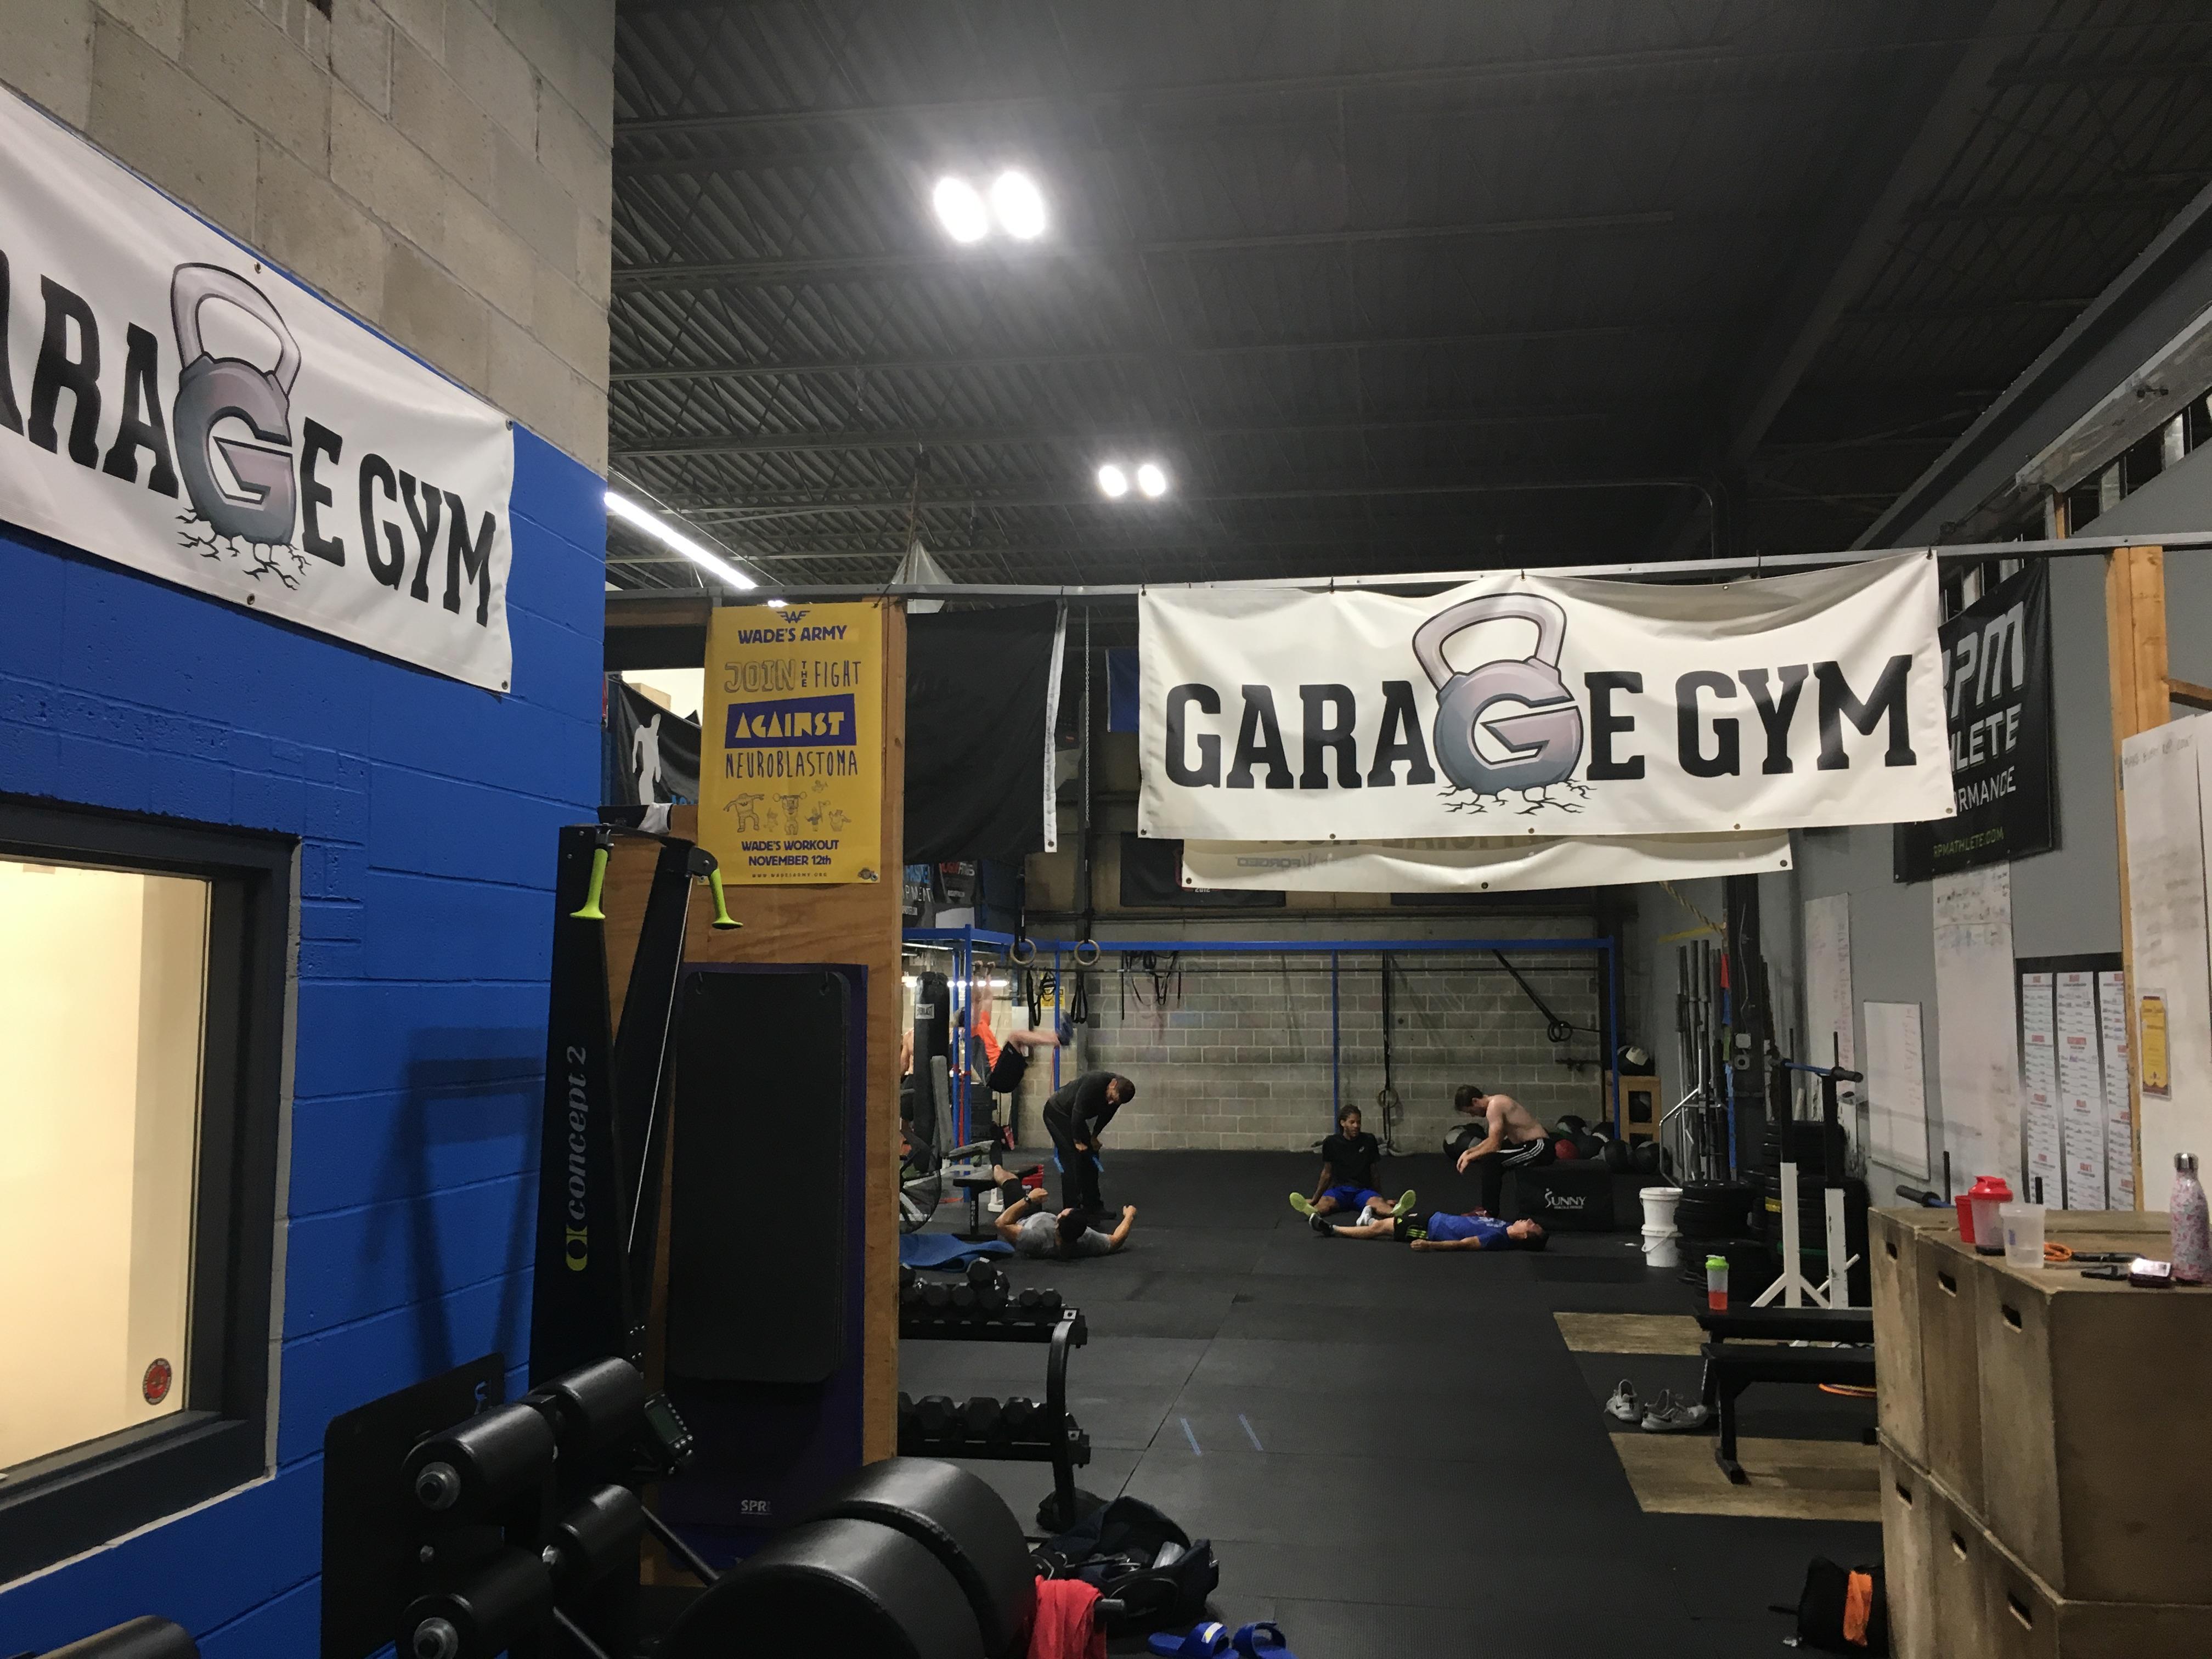 Garage gym natick u zach even esh